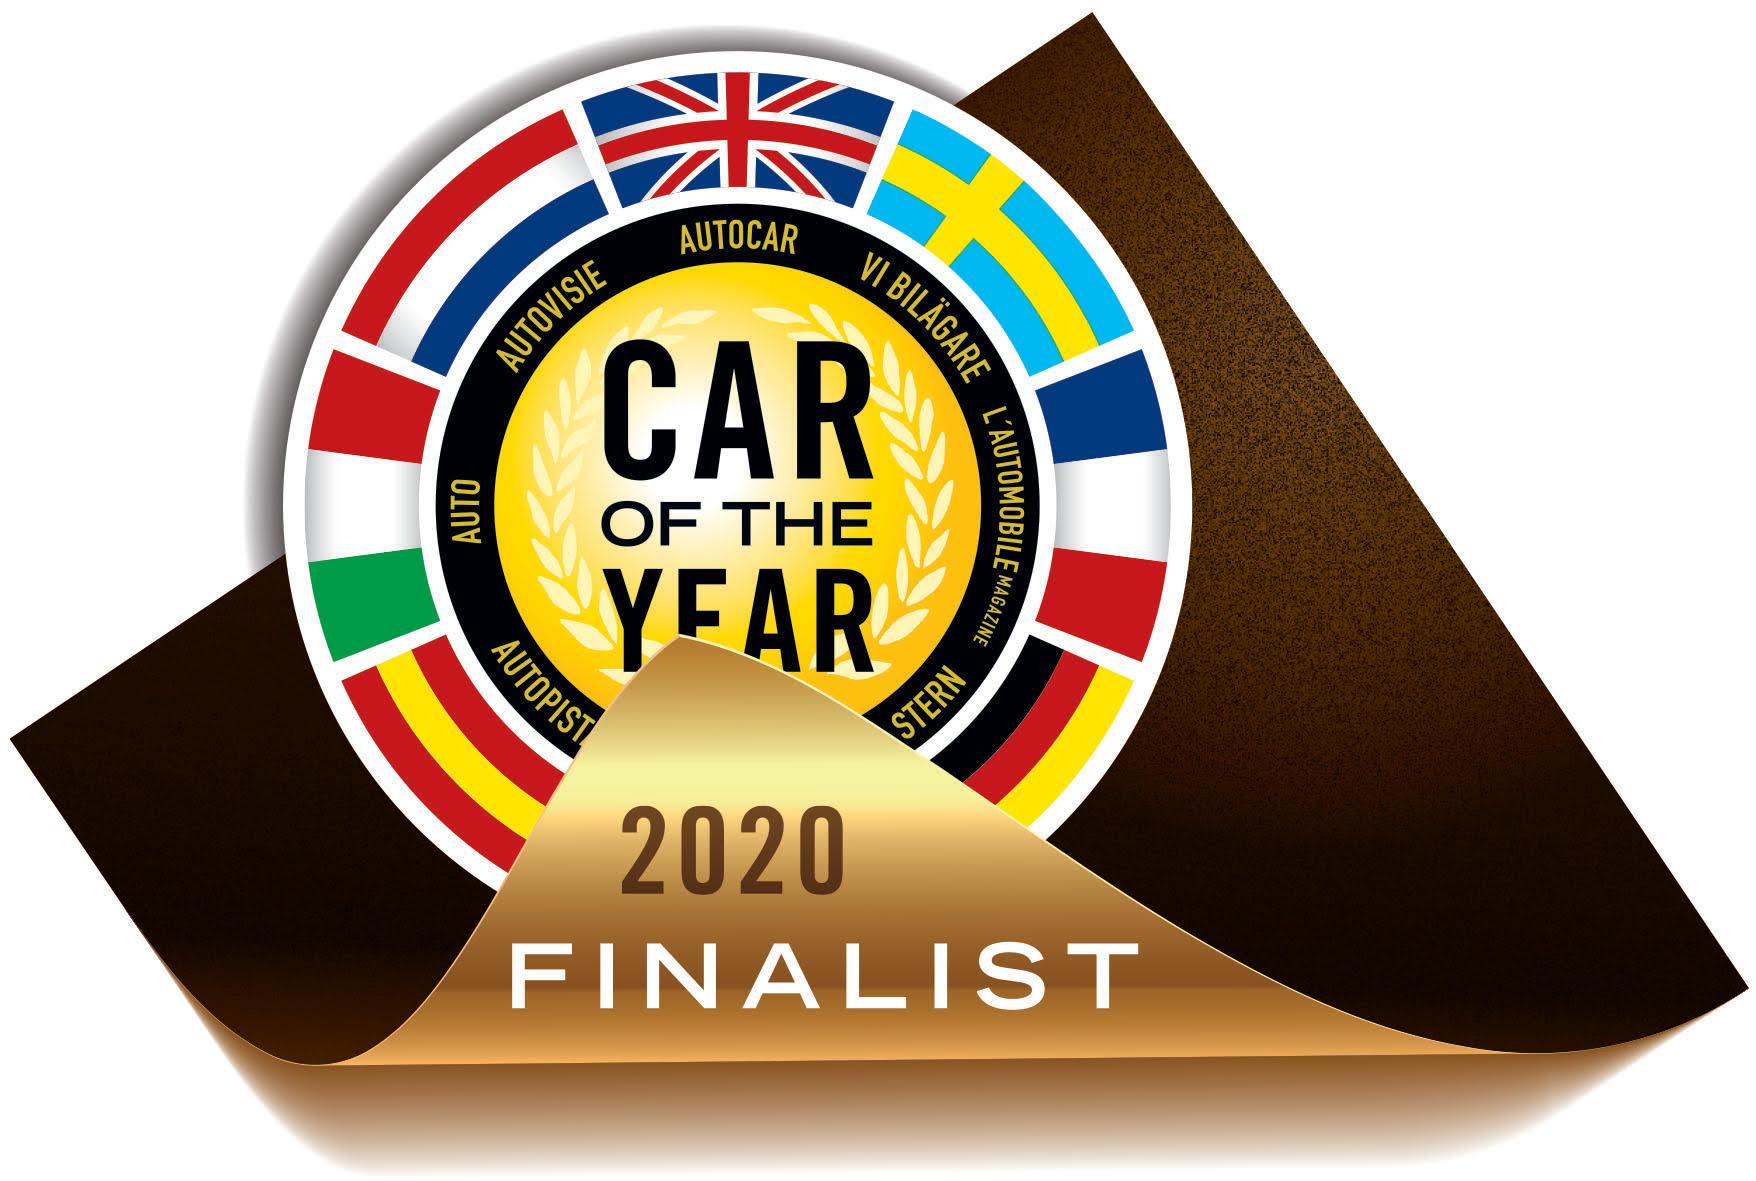 Novi Peugeot 208 finalist nagrade Car of The Year 2020